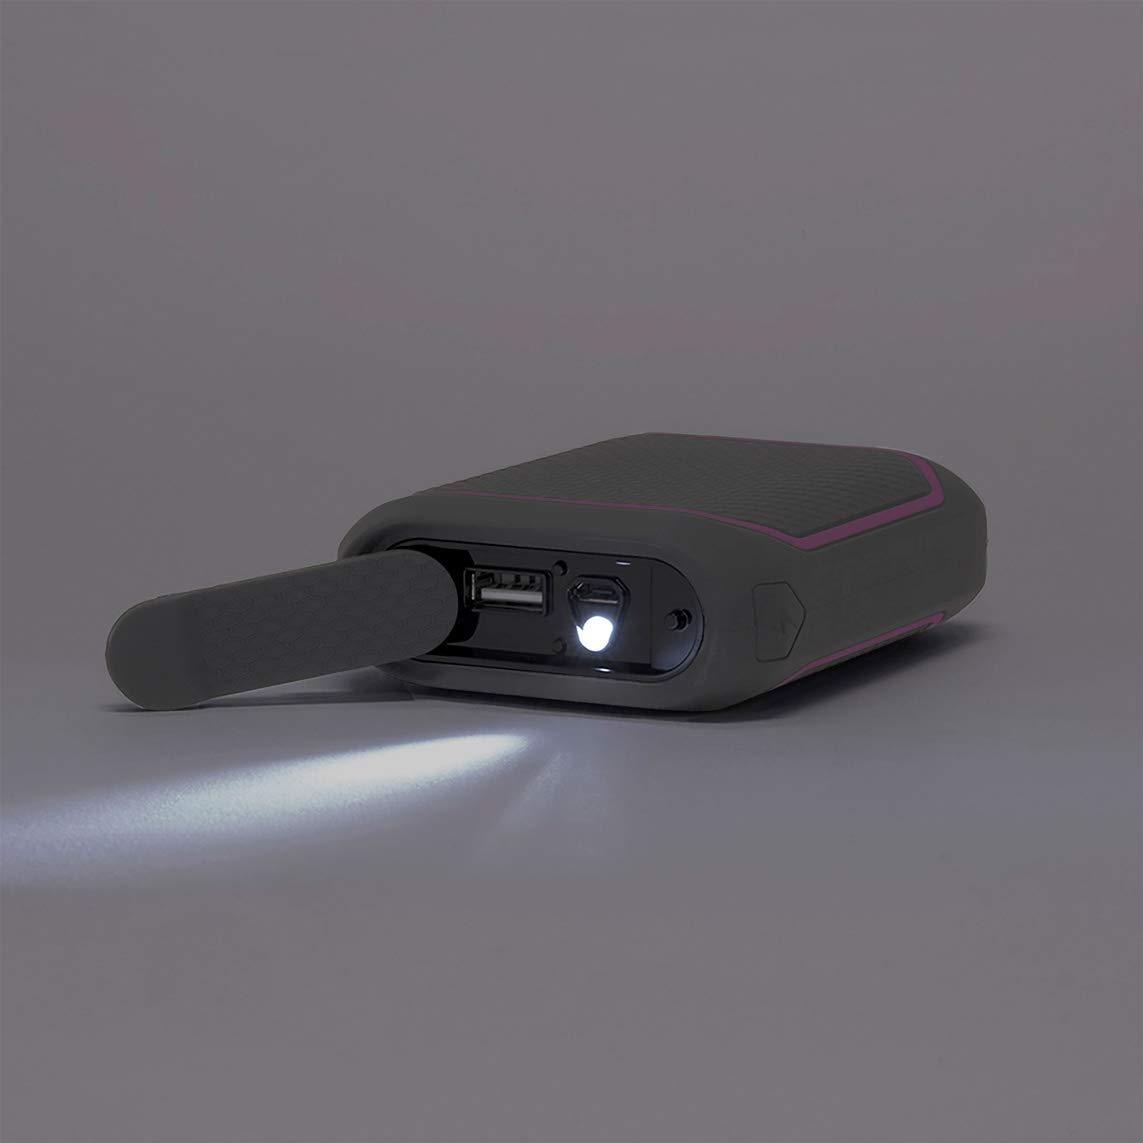 GC42500-XX - Griffin Survivor Rugged Power Bank Battery: 10,050 mAh Color: 3 Color Options